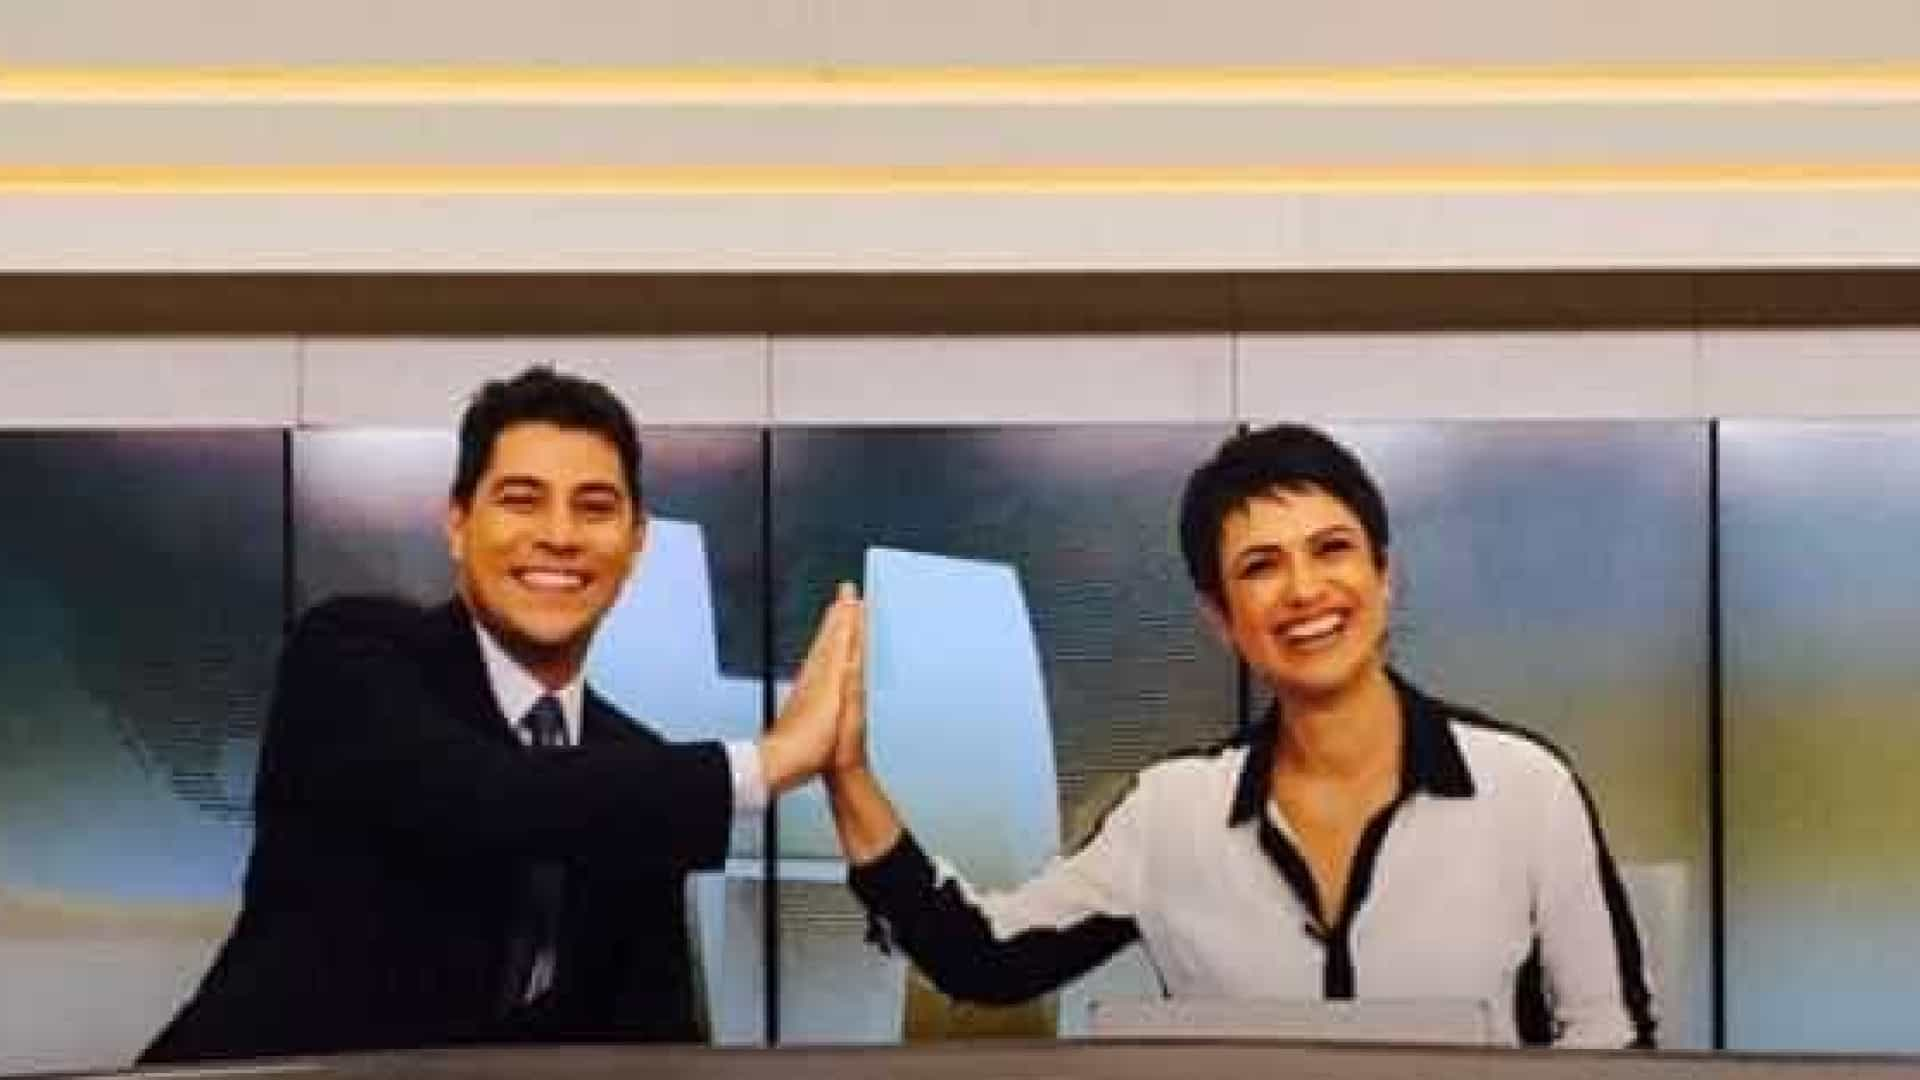 Público comemora reencontro de Sandra  e Evaristo no 'JH'